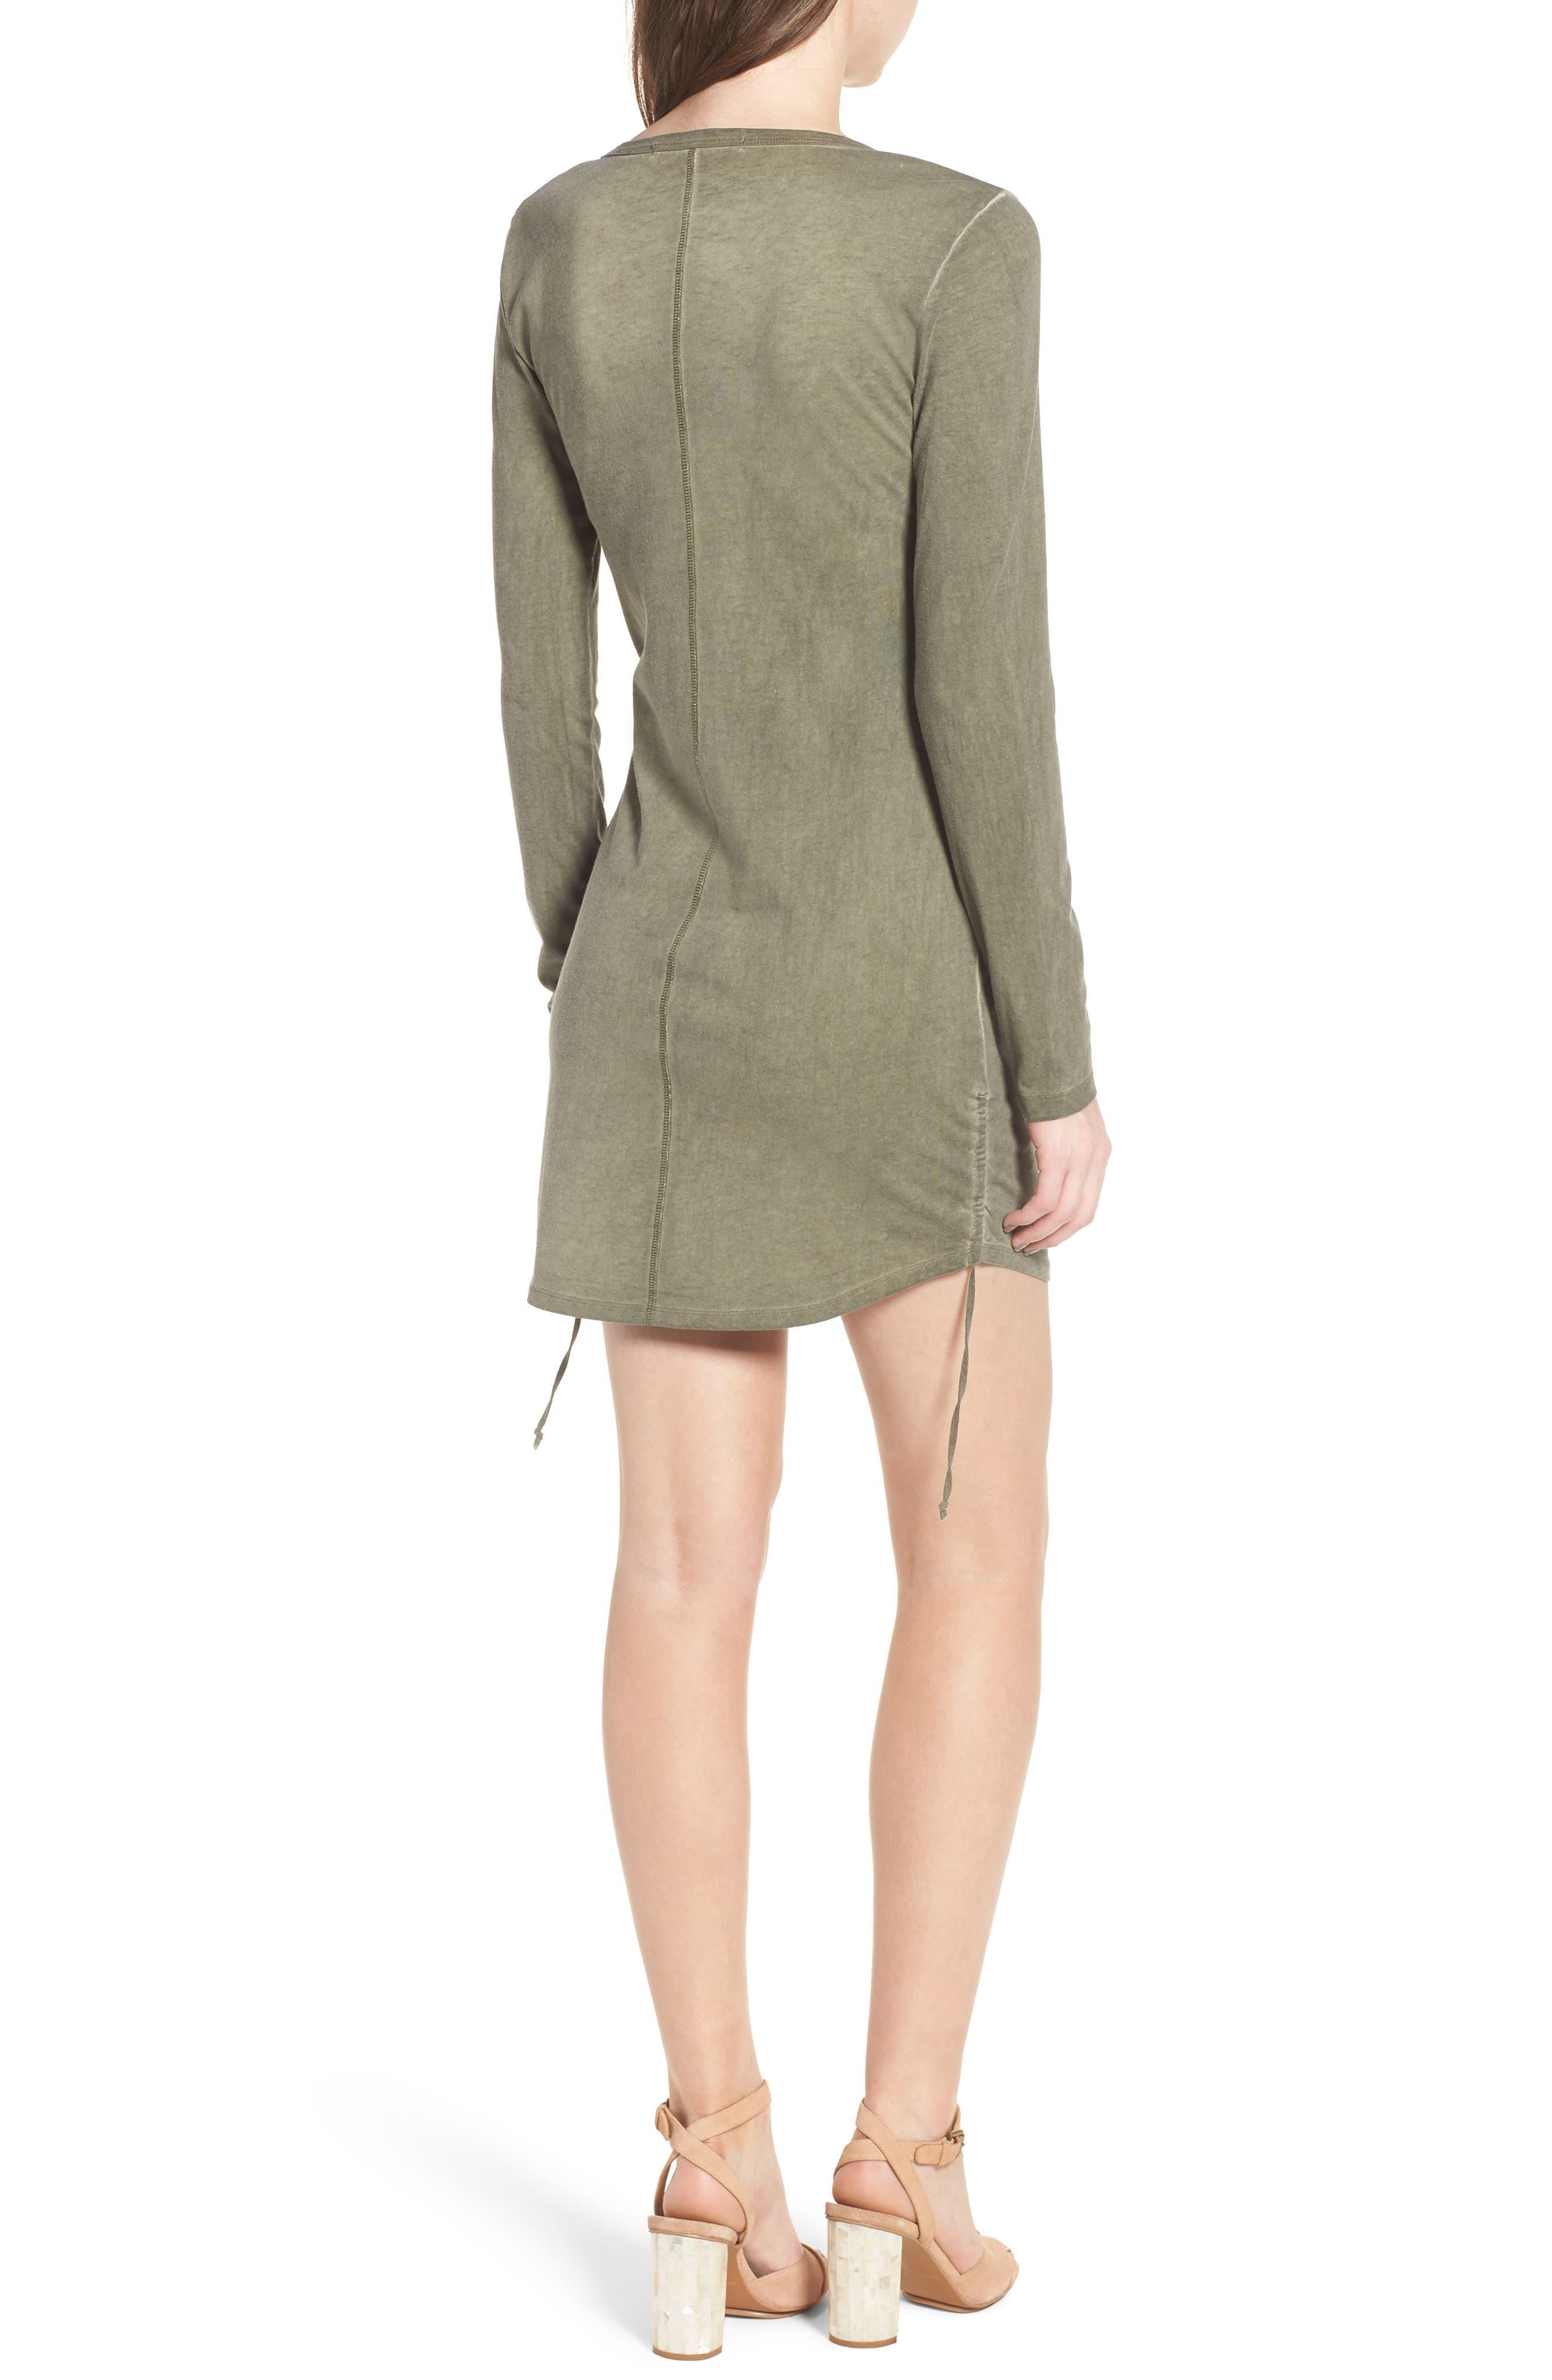 Scoop Neck Body-Con Dress,                             Alternate thumbnail 2, color,                             Olive Smoke